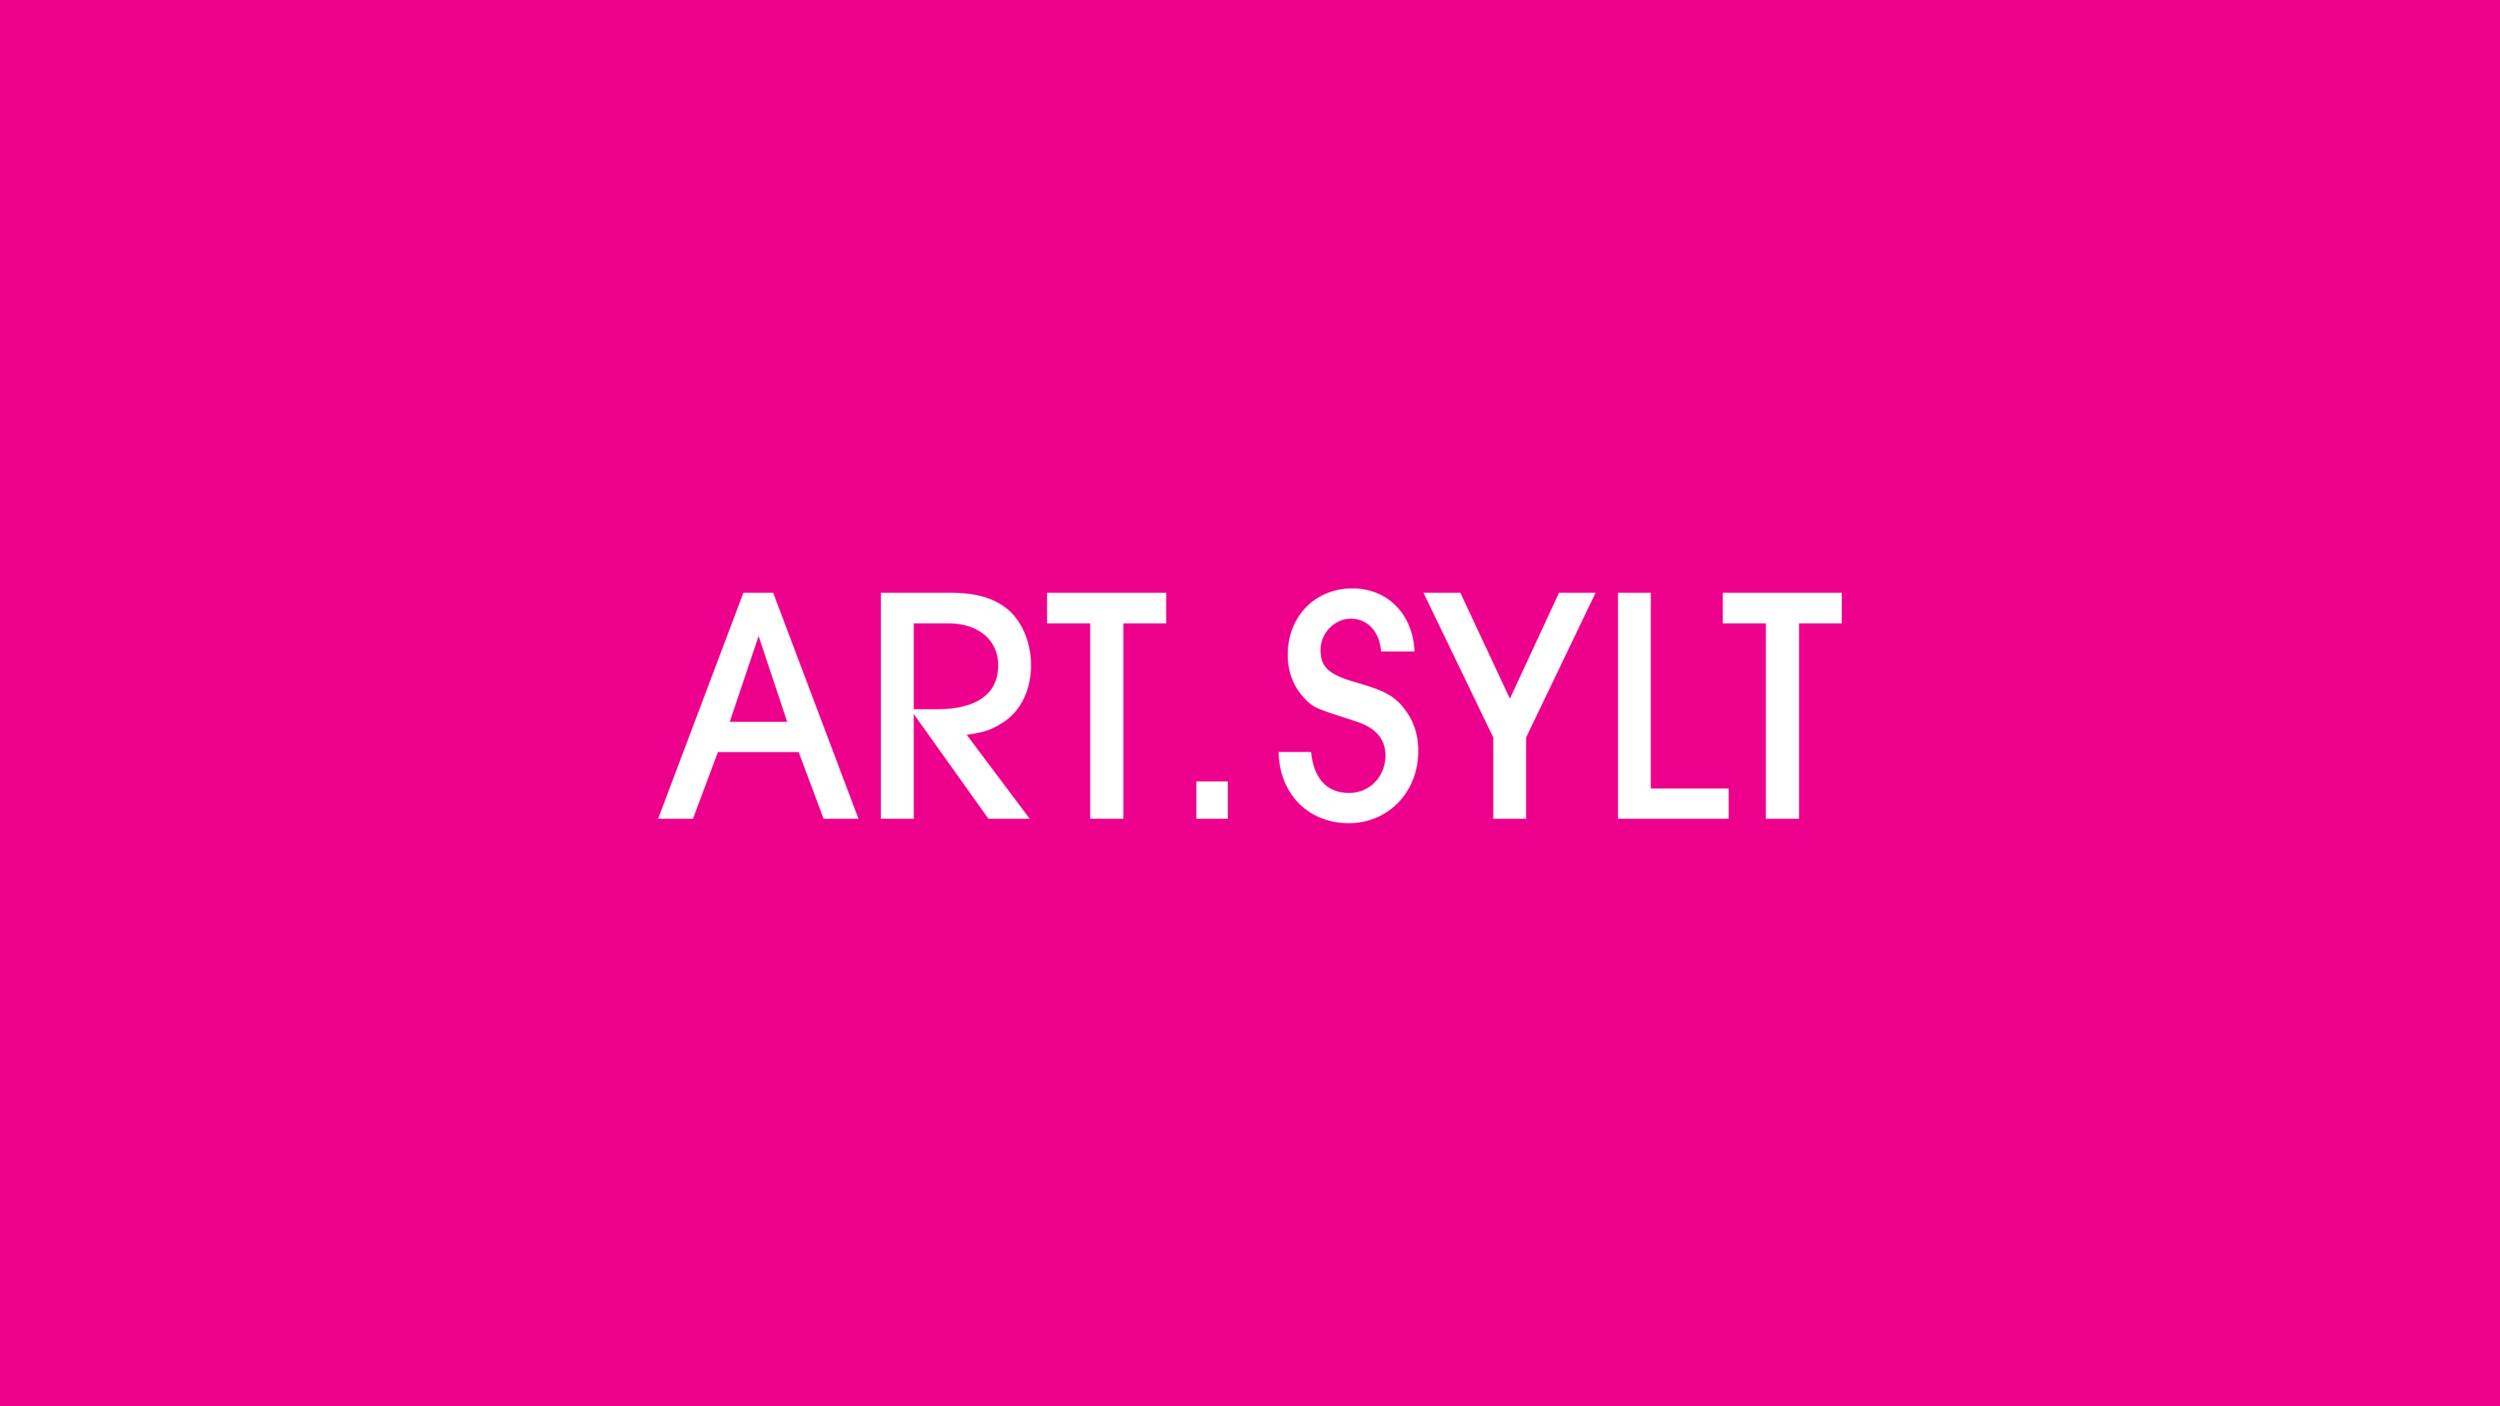 2015-ART-SYLT-banner.png